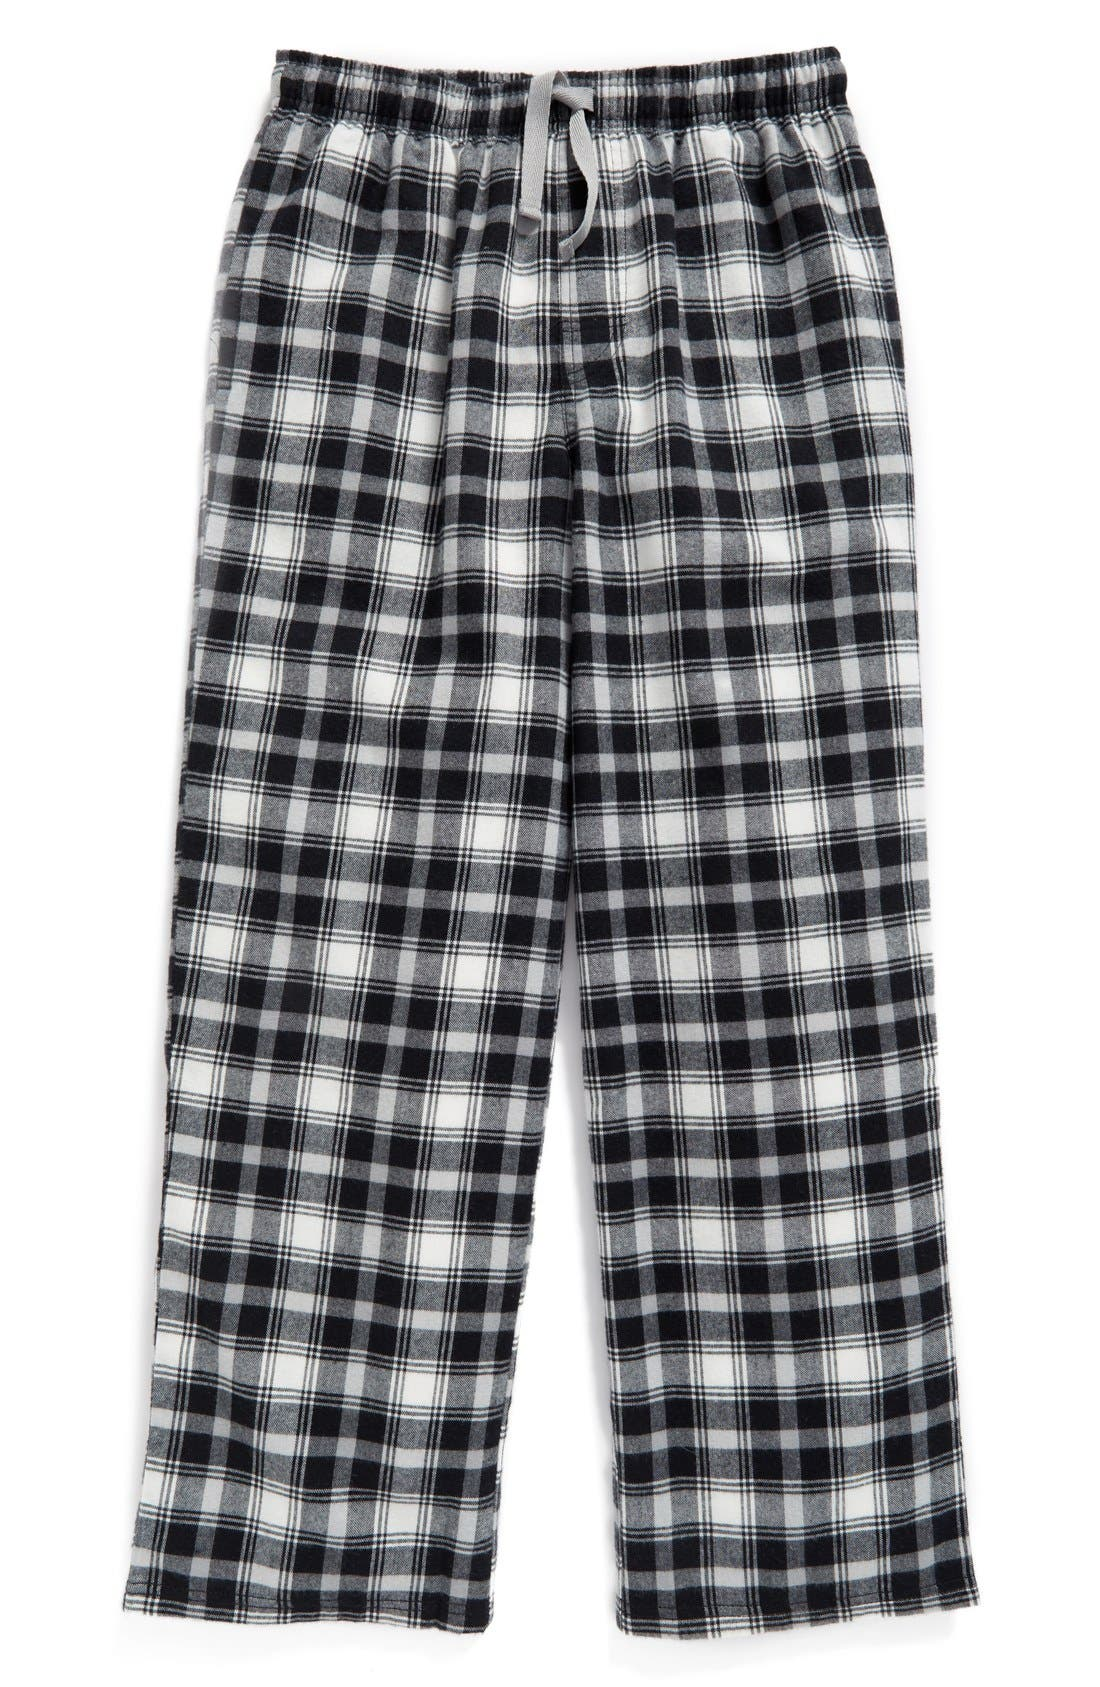 Main Image - Tucker + Tate Flannel Pajama Pants (Little Boys & Big Boys)